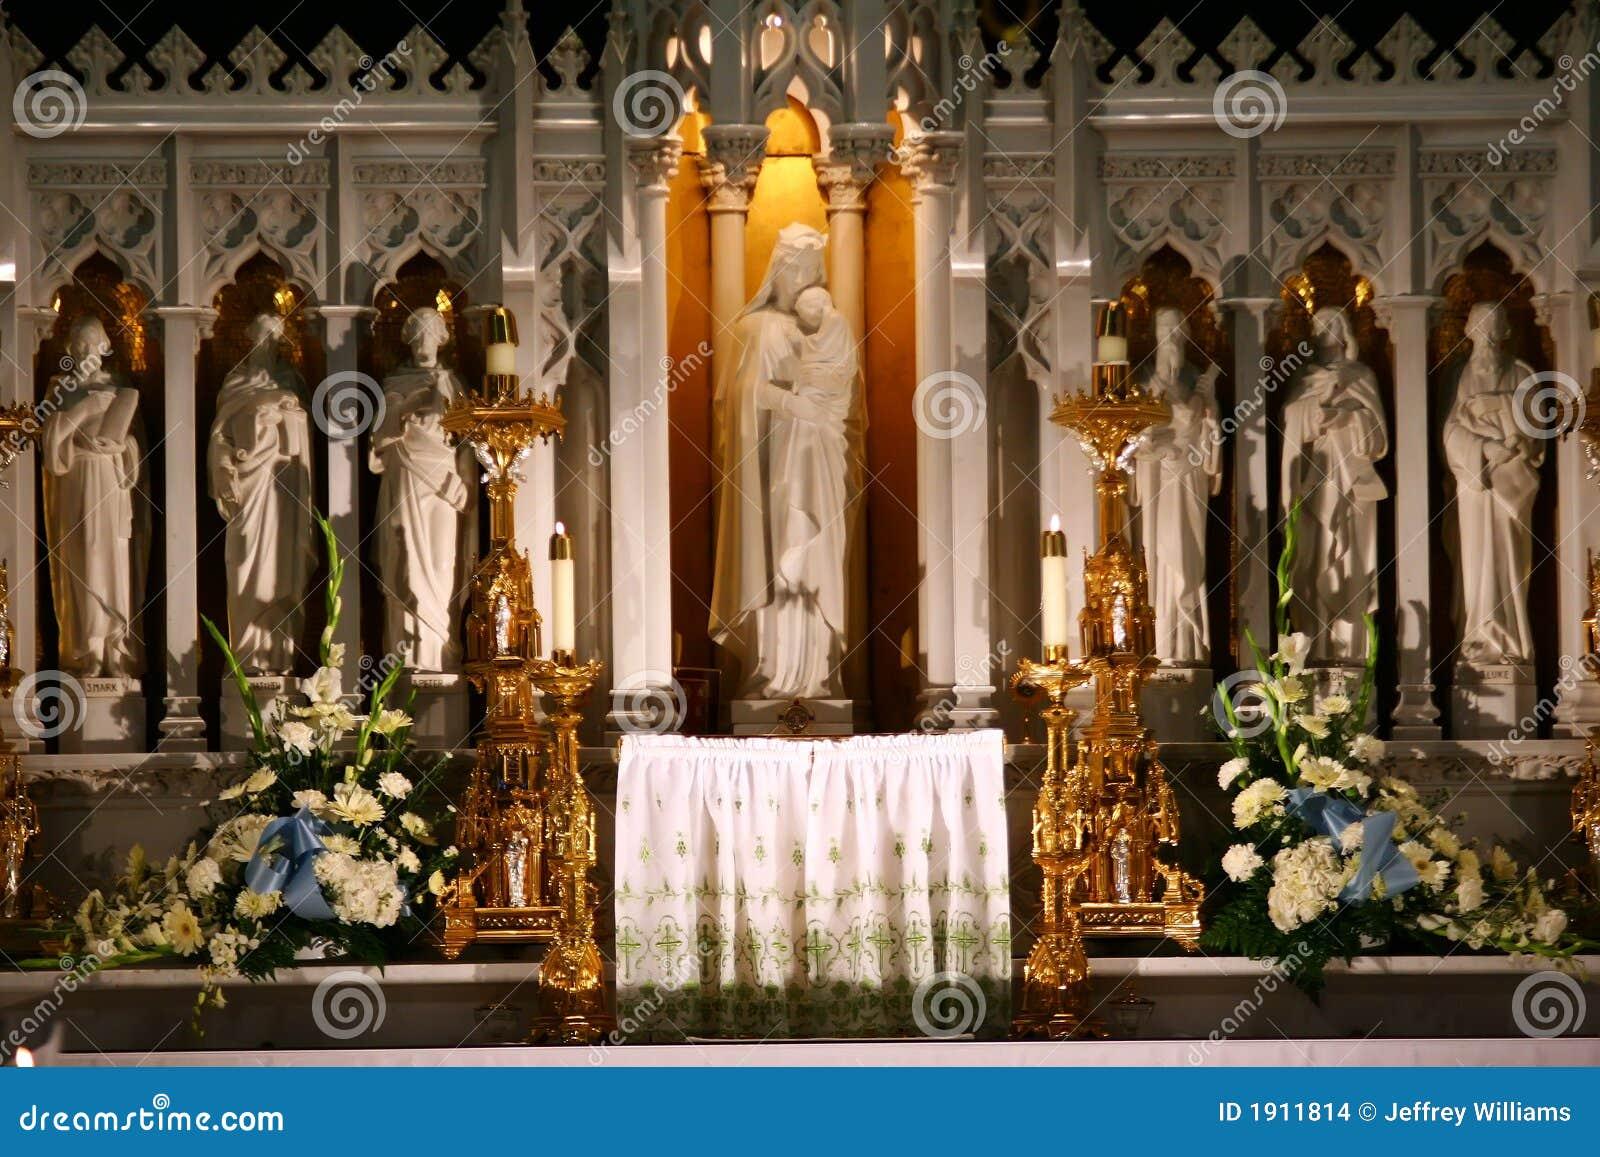 Catholic Church Altar Stock Photo. Image Of Traditional